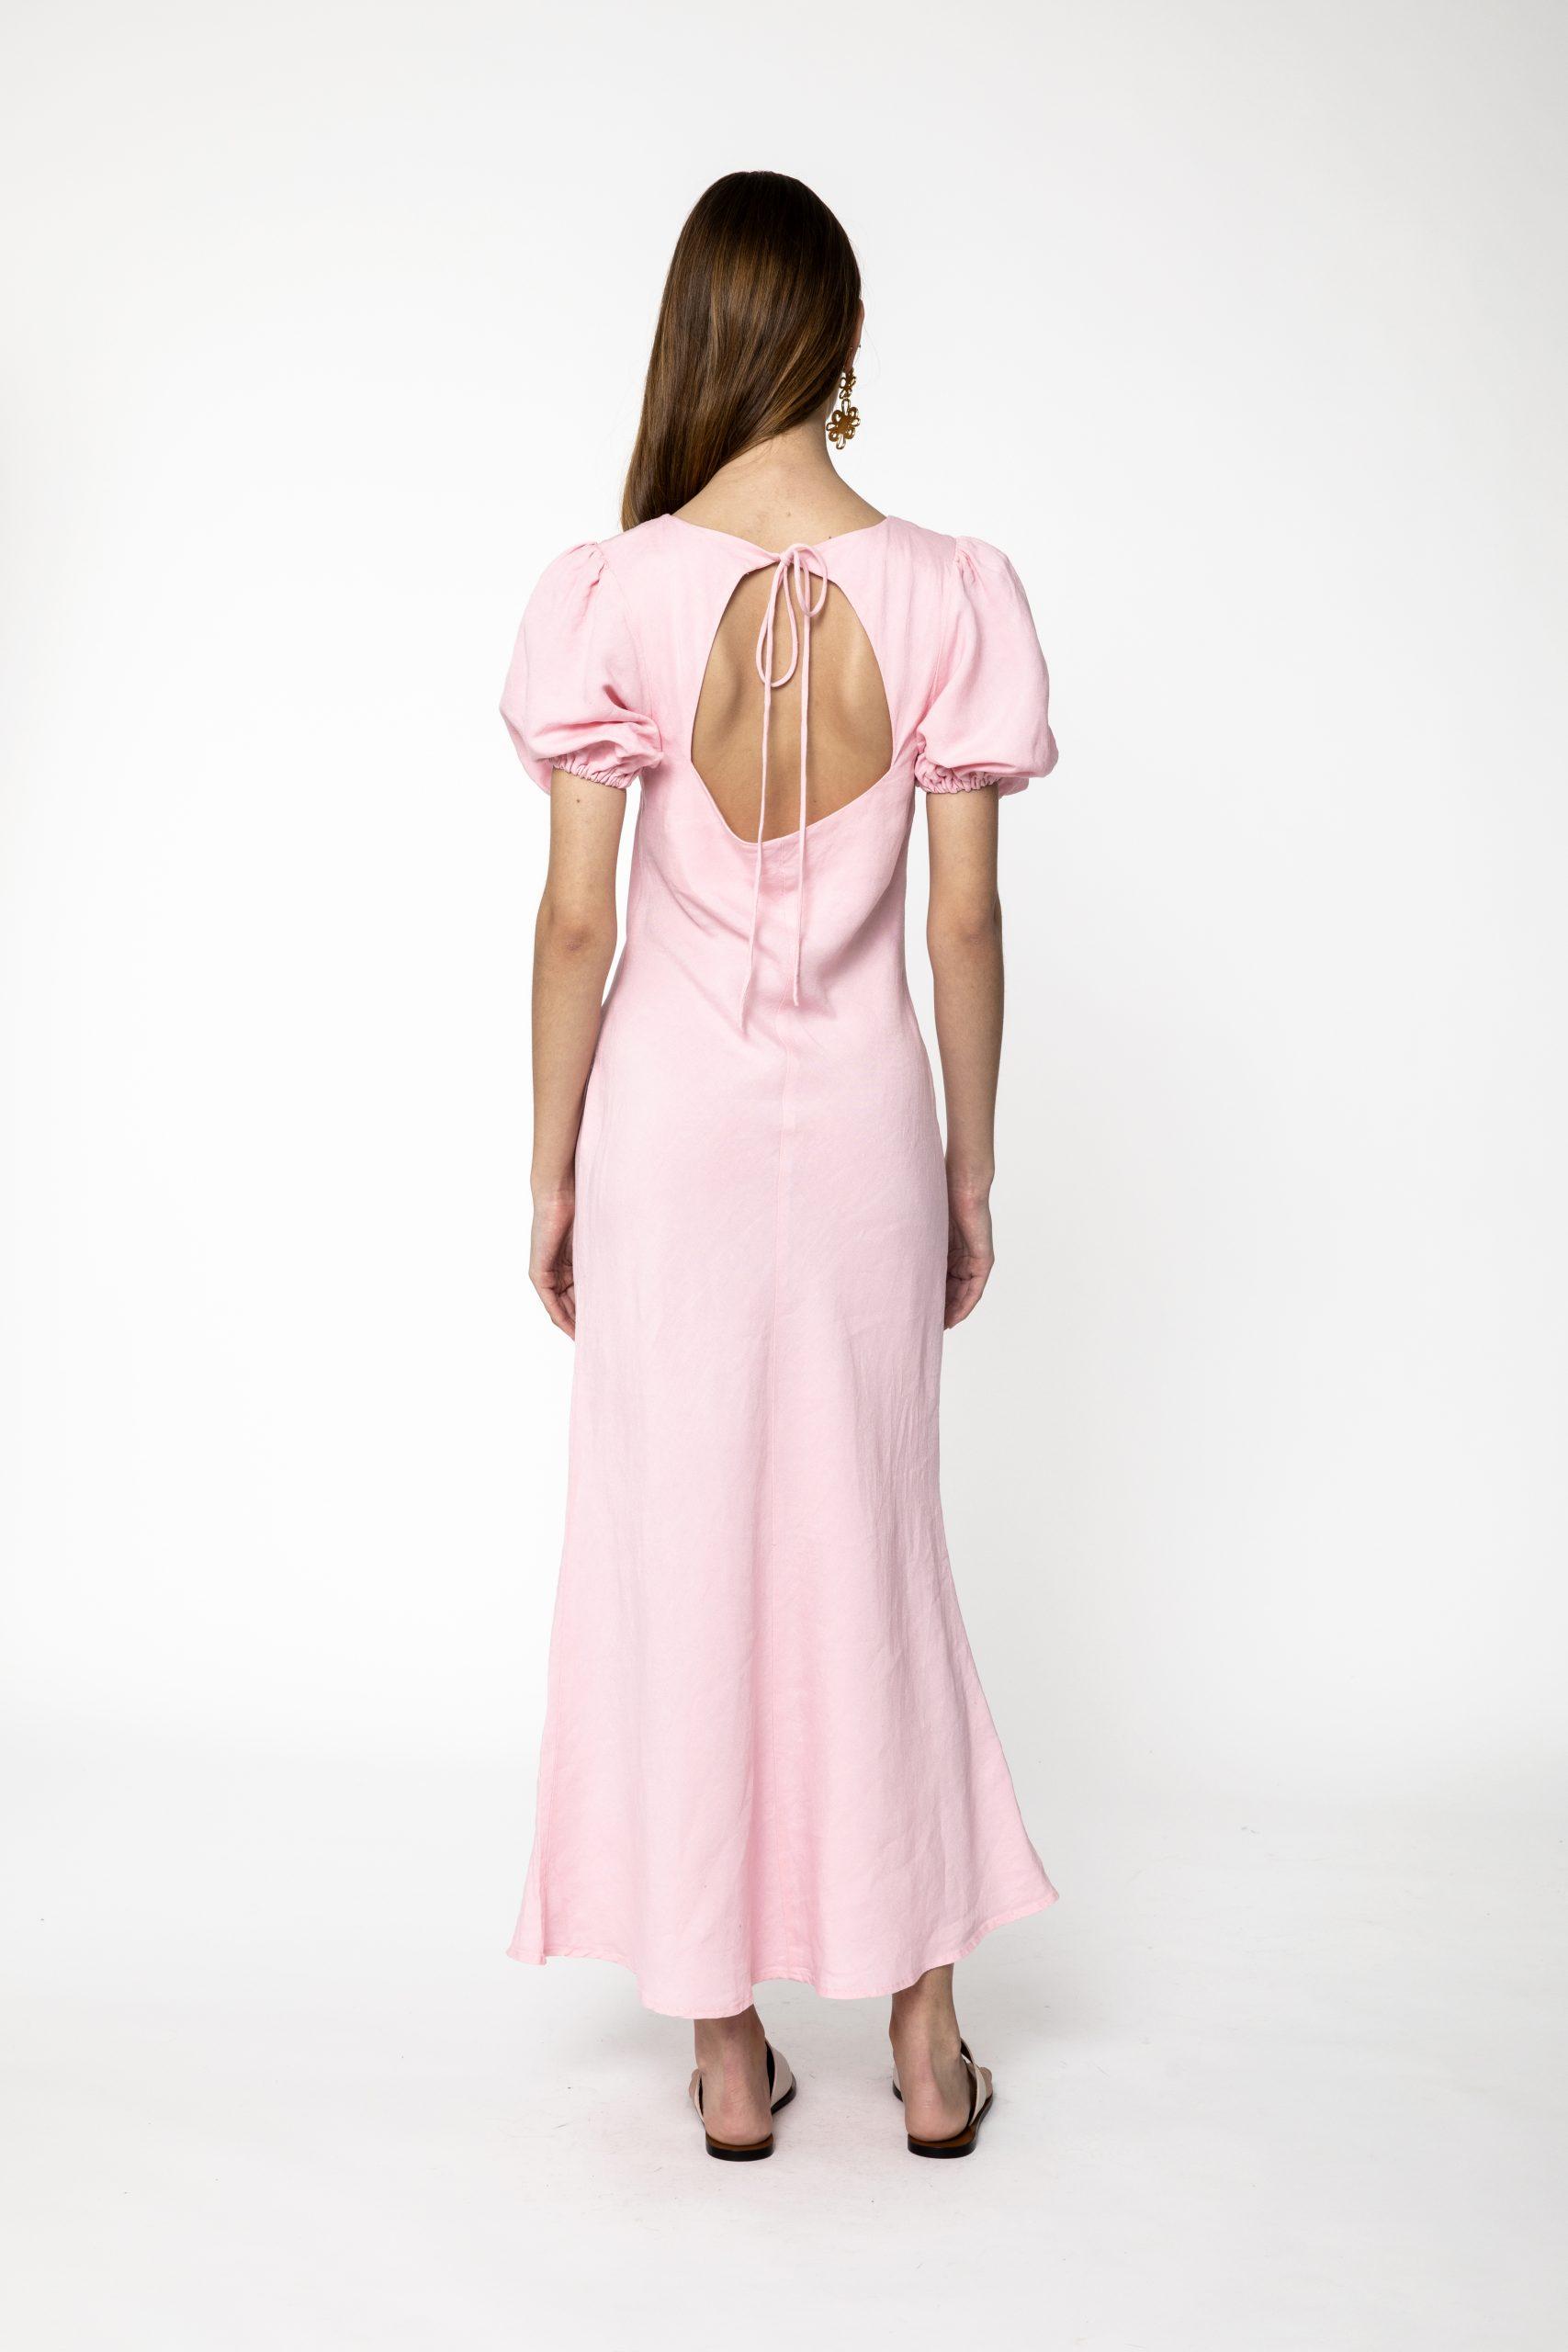 RUBY KENDALL LINEN DRESS PINK BACK